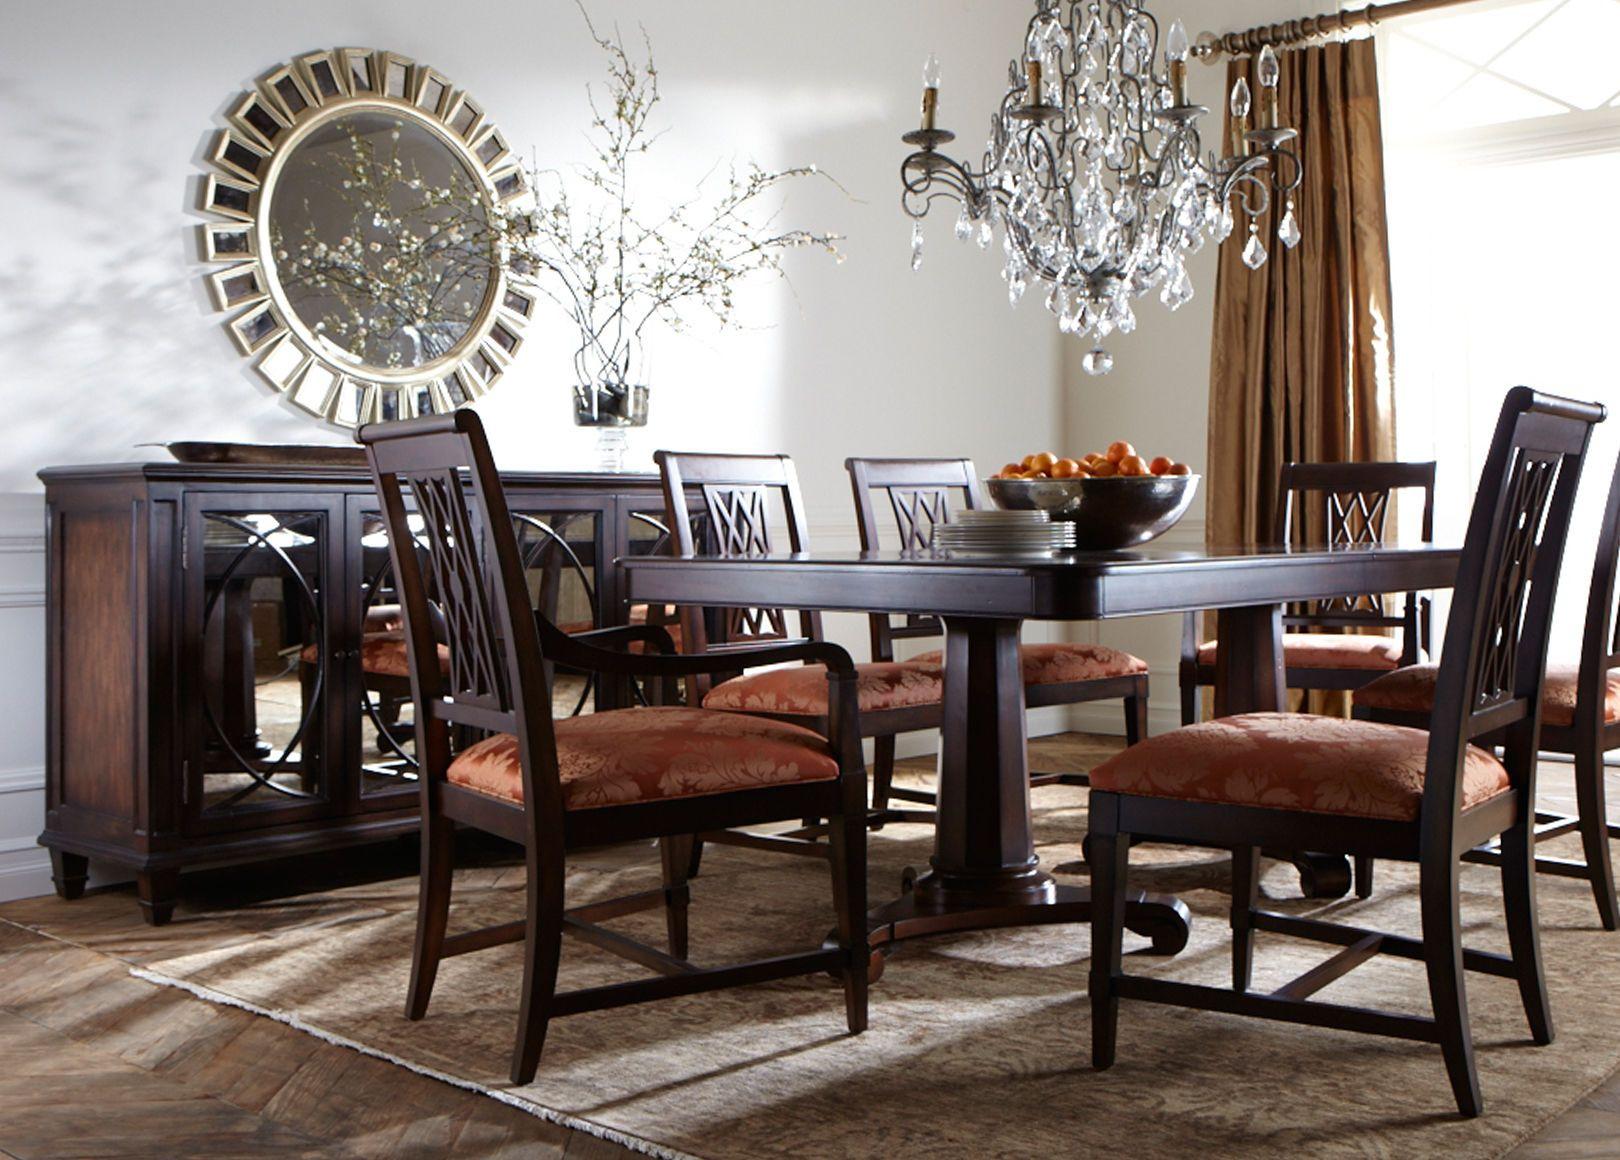 Ethan Allen Dining Room Tables Ethan Allen Dining Room Tables – Ethan Allen Dining Room Tables